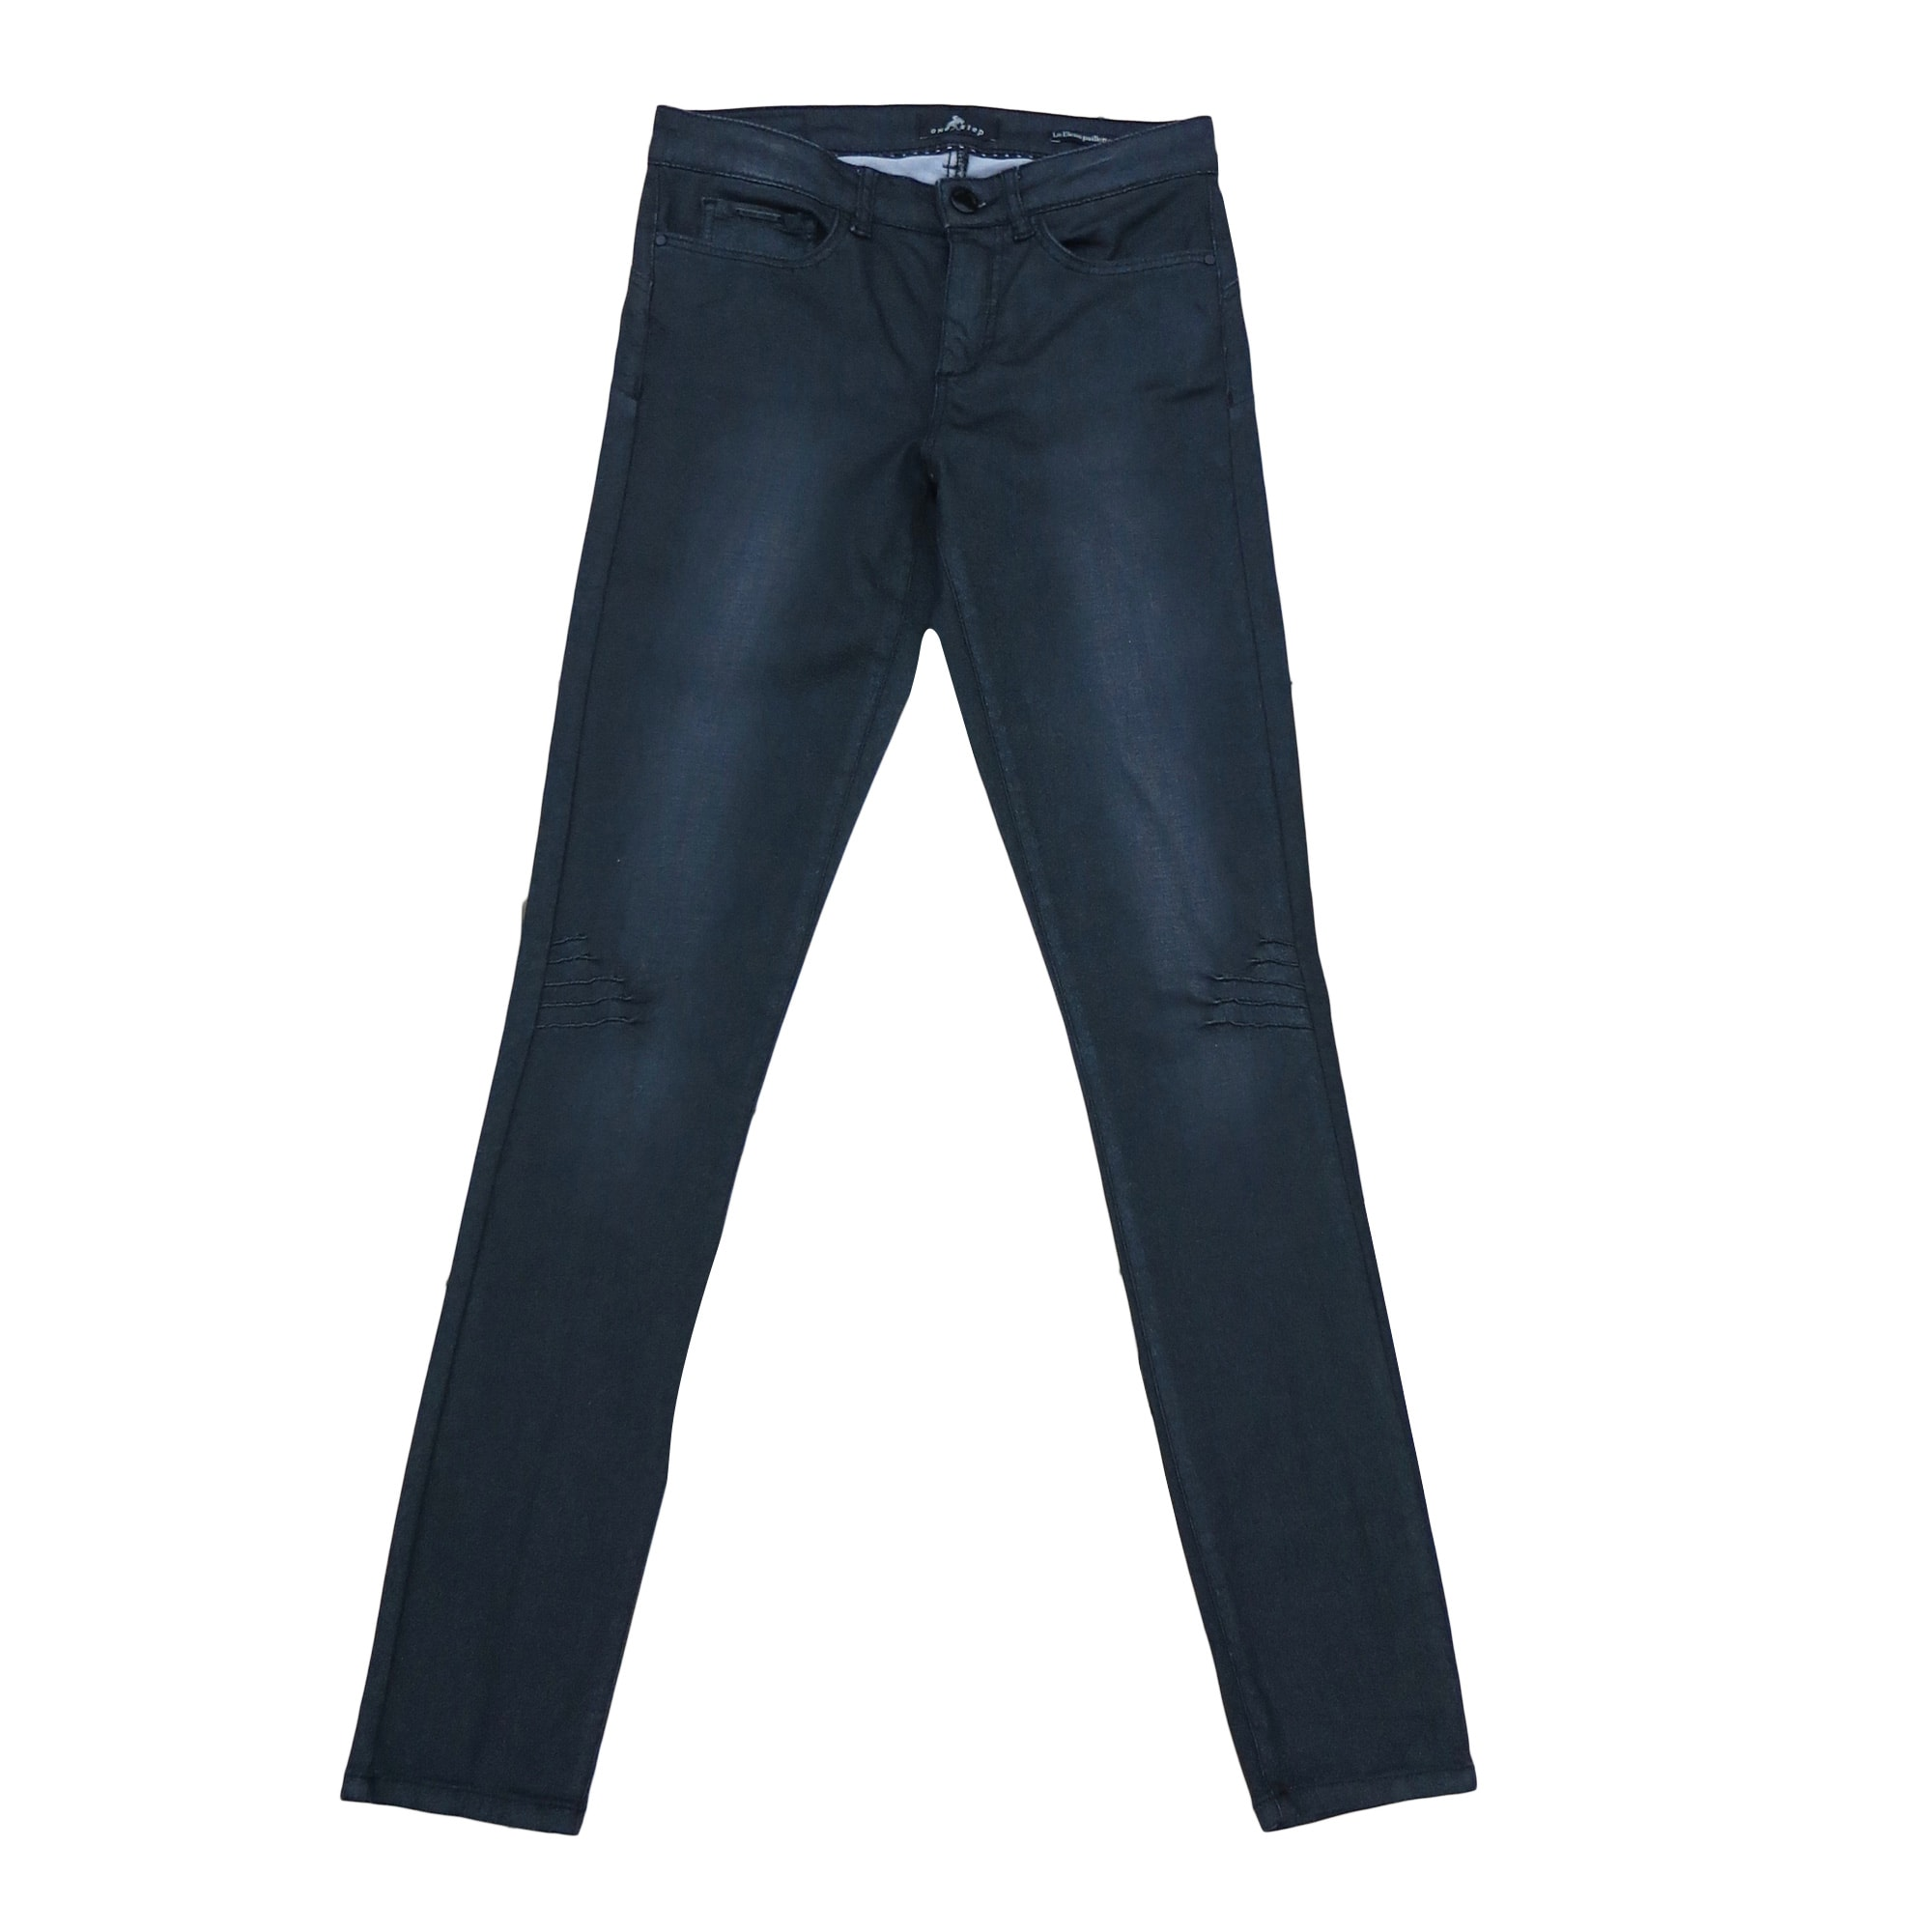 Pantalon slim, cigarette ONE STEP Noir